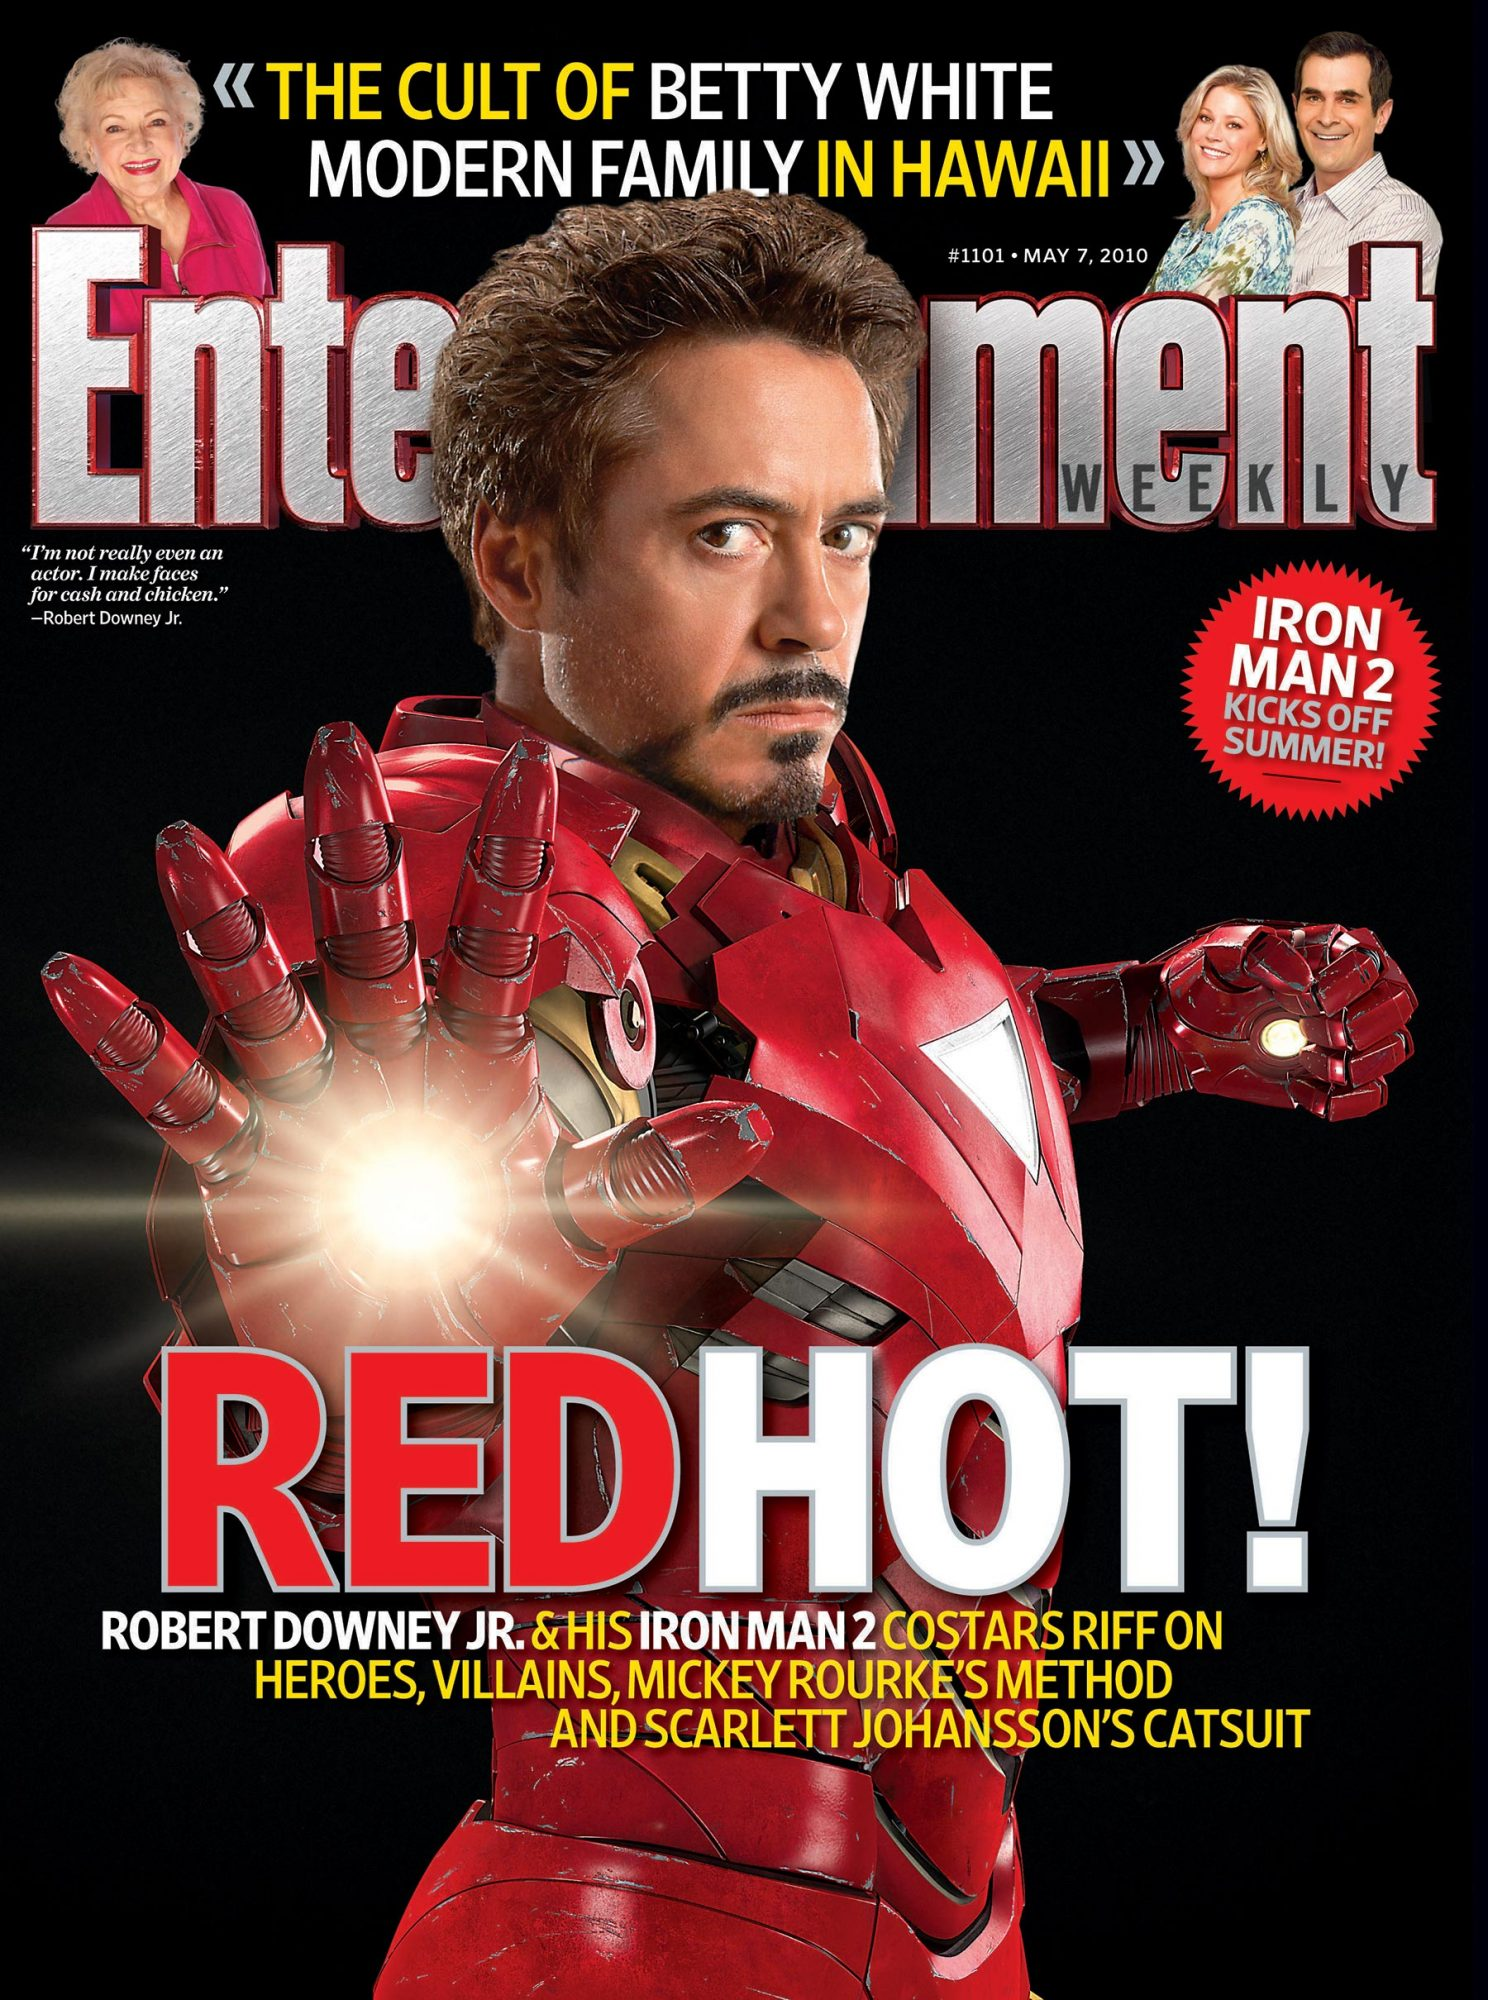 Entertainment WeeklyIssue 1101Iron Man 2